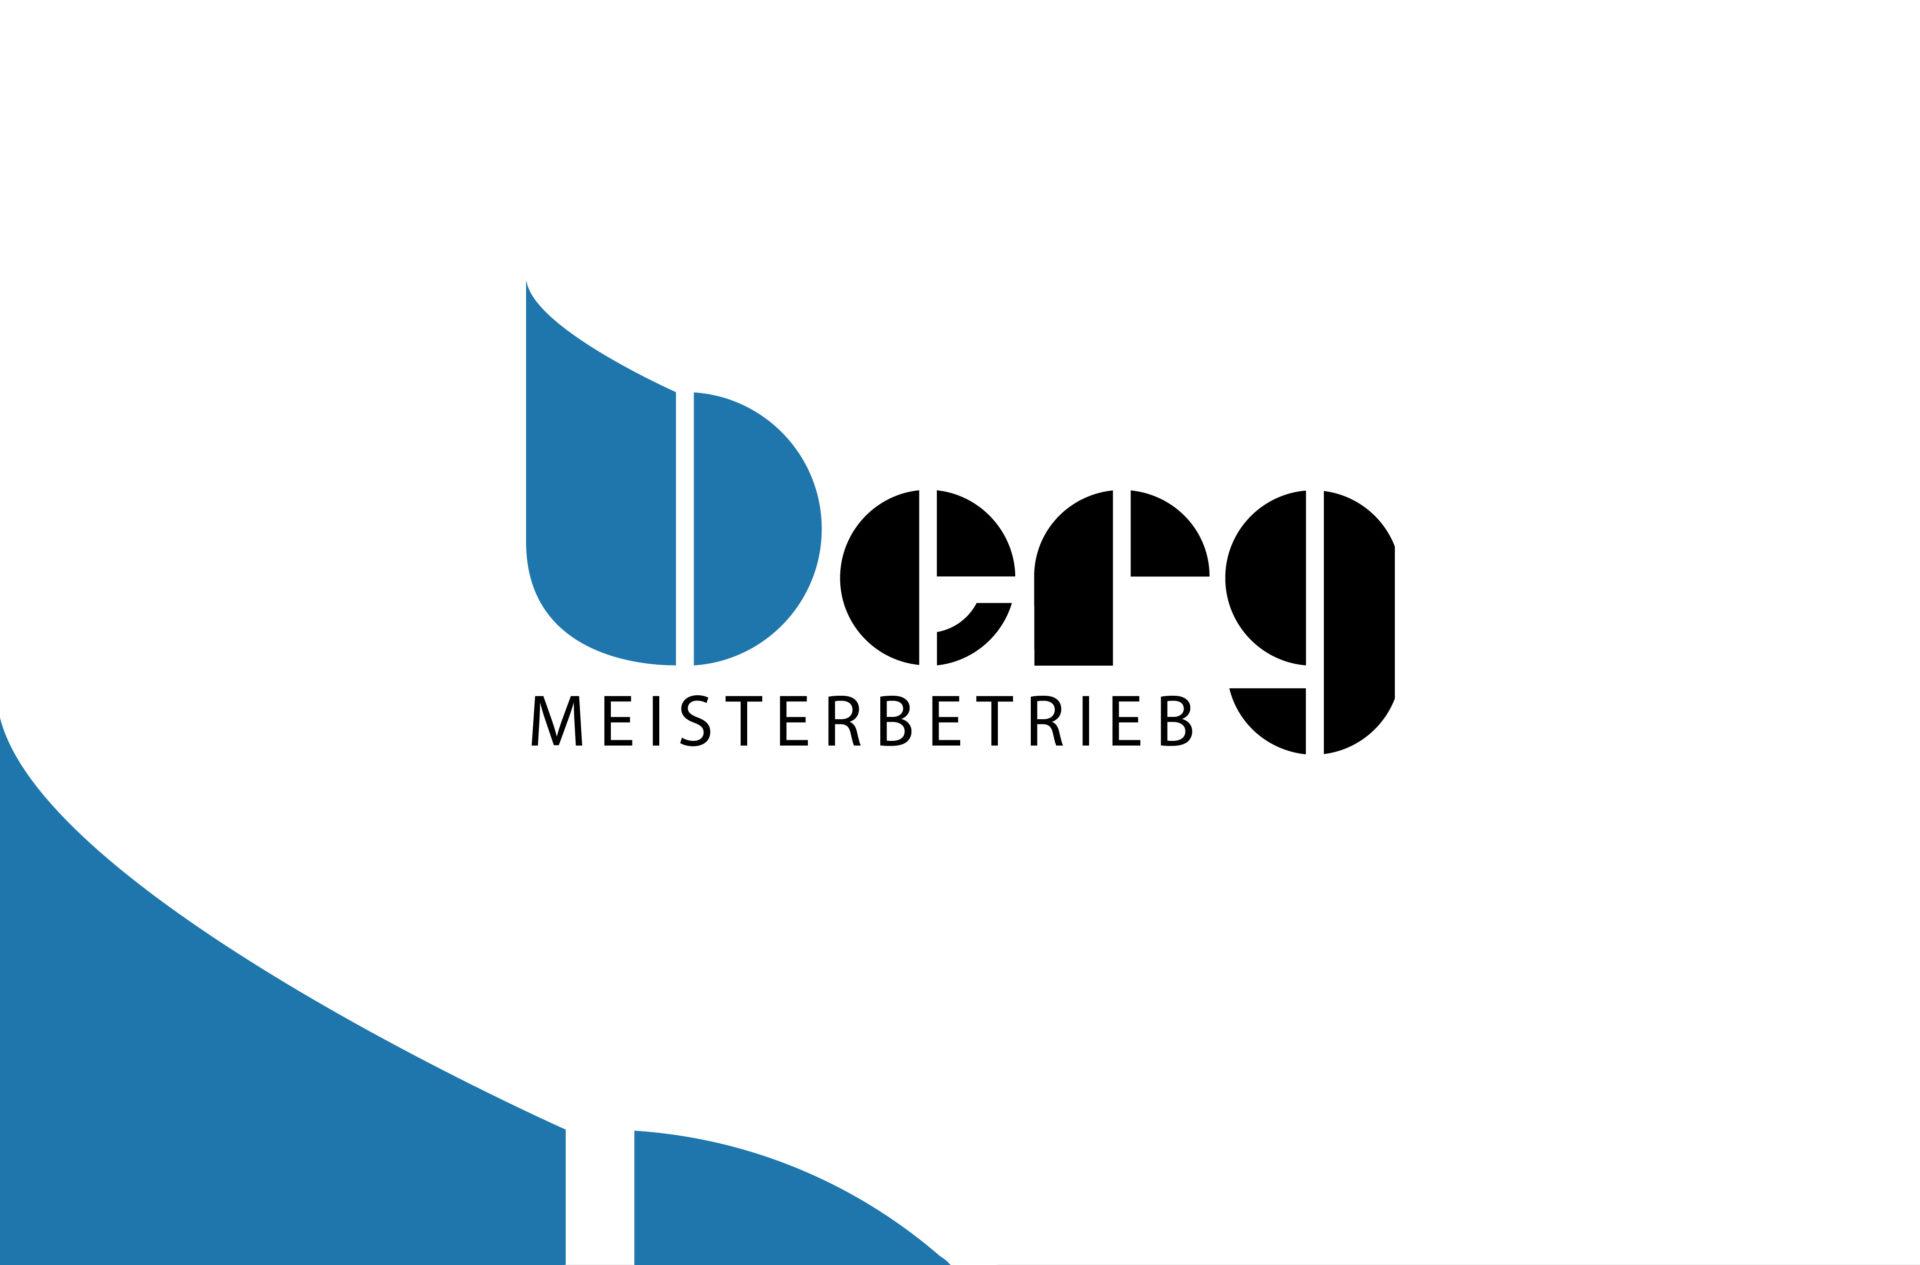 Tischlerei Berg Referenz 1 Logo Corporate Design Logogestaltung